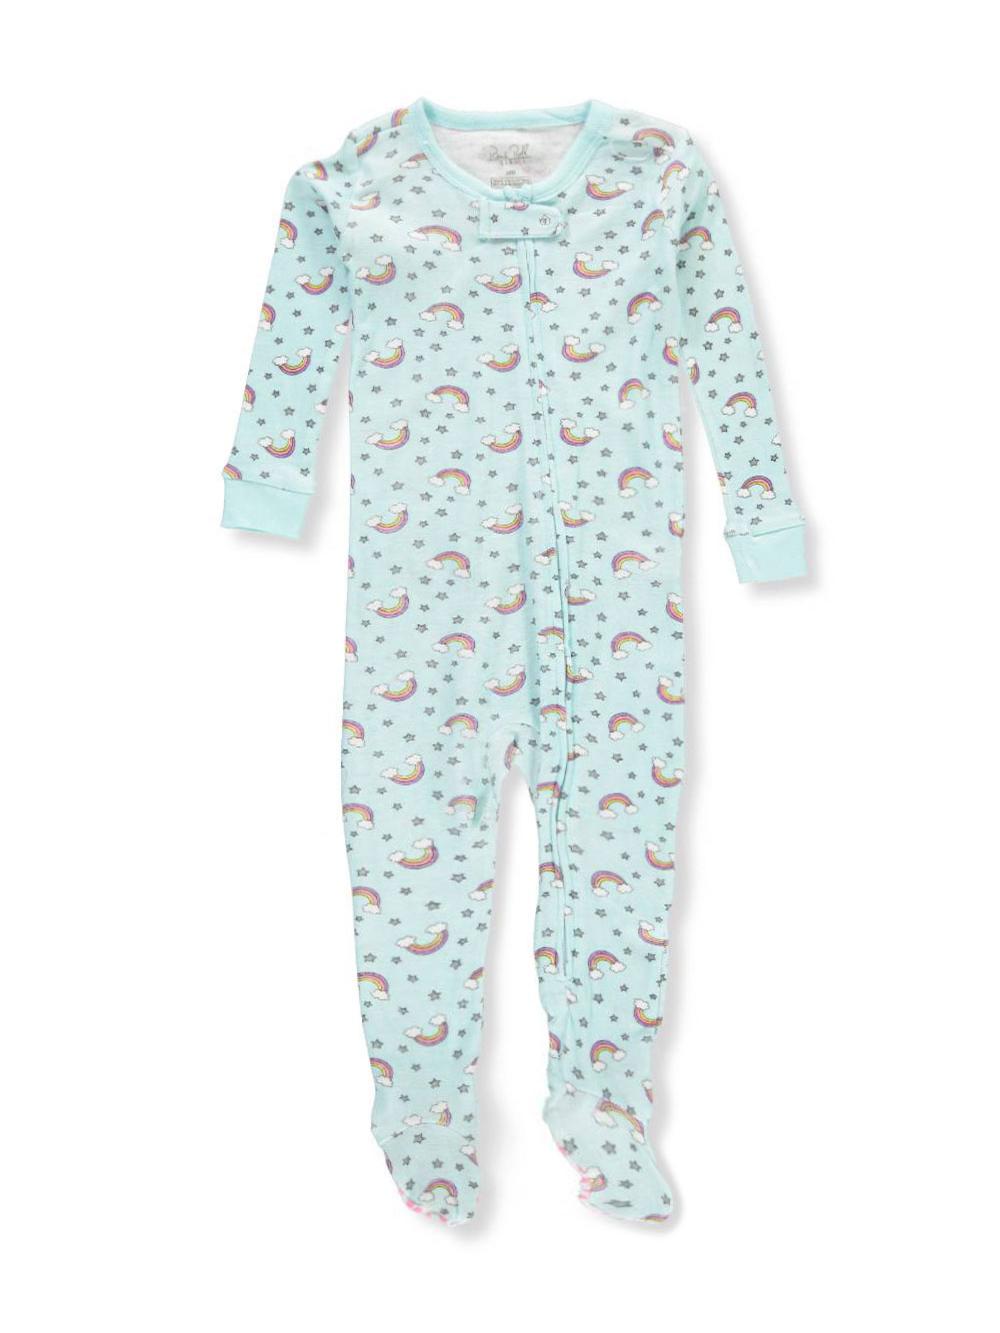 9cf19b8f7 Rene Rofe Baby Girls' 1-Piece Footed Pajamas